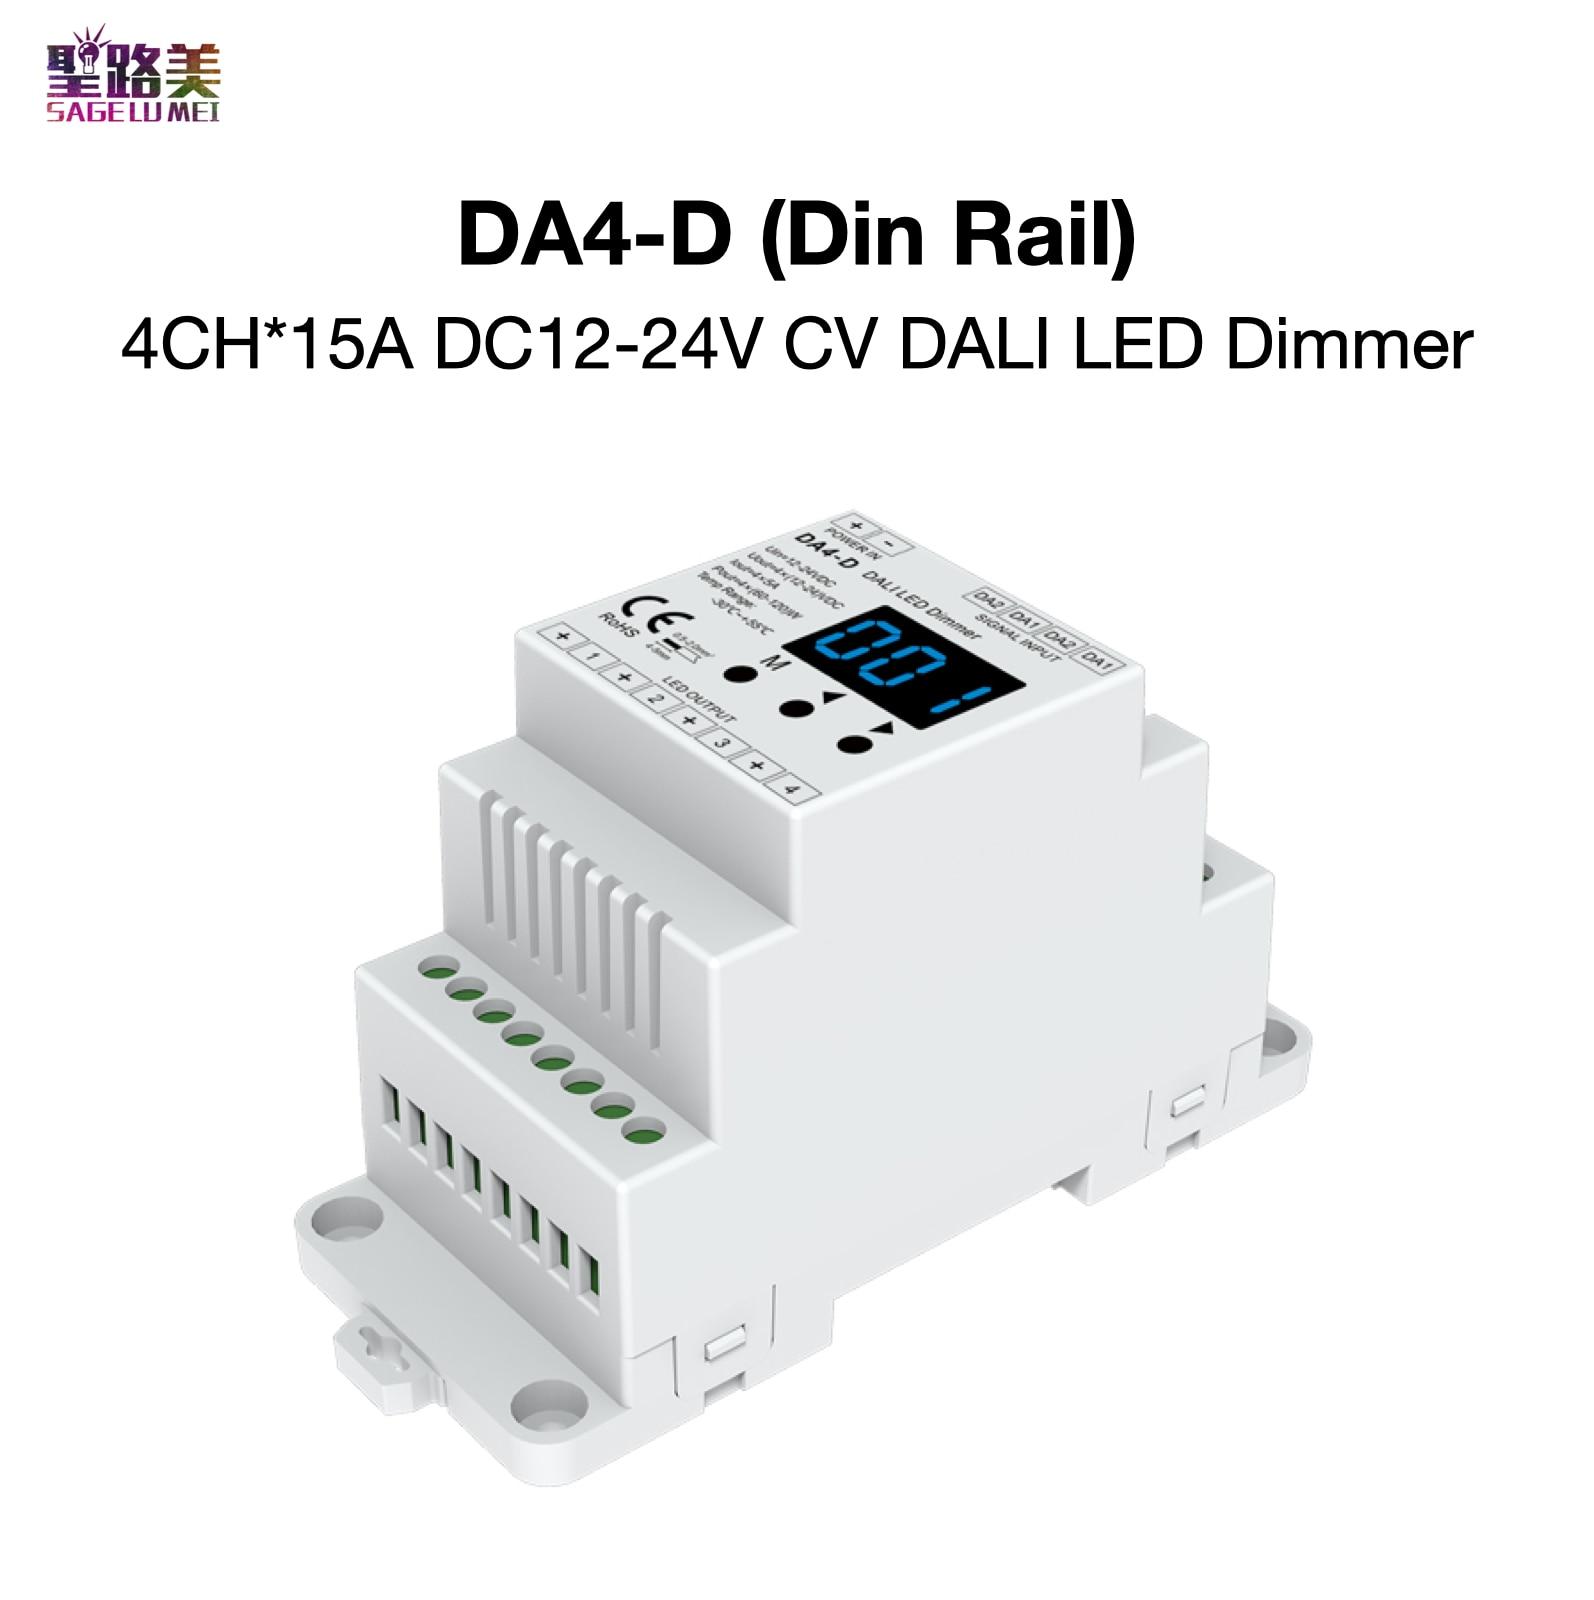 DA4-D (الدين السكك الحديدية) 4CH * 15A DC12-24V CV دالي LED باهتة 1-4 دالي عنوان اختيار 4 قناة الجهد المستمر PMW يعتم SkyDance